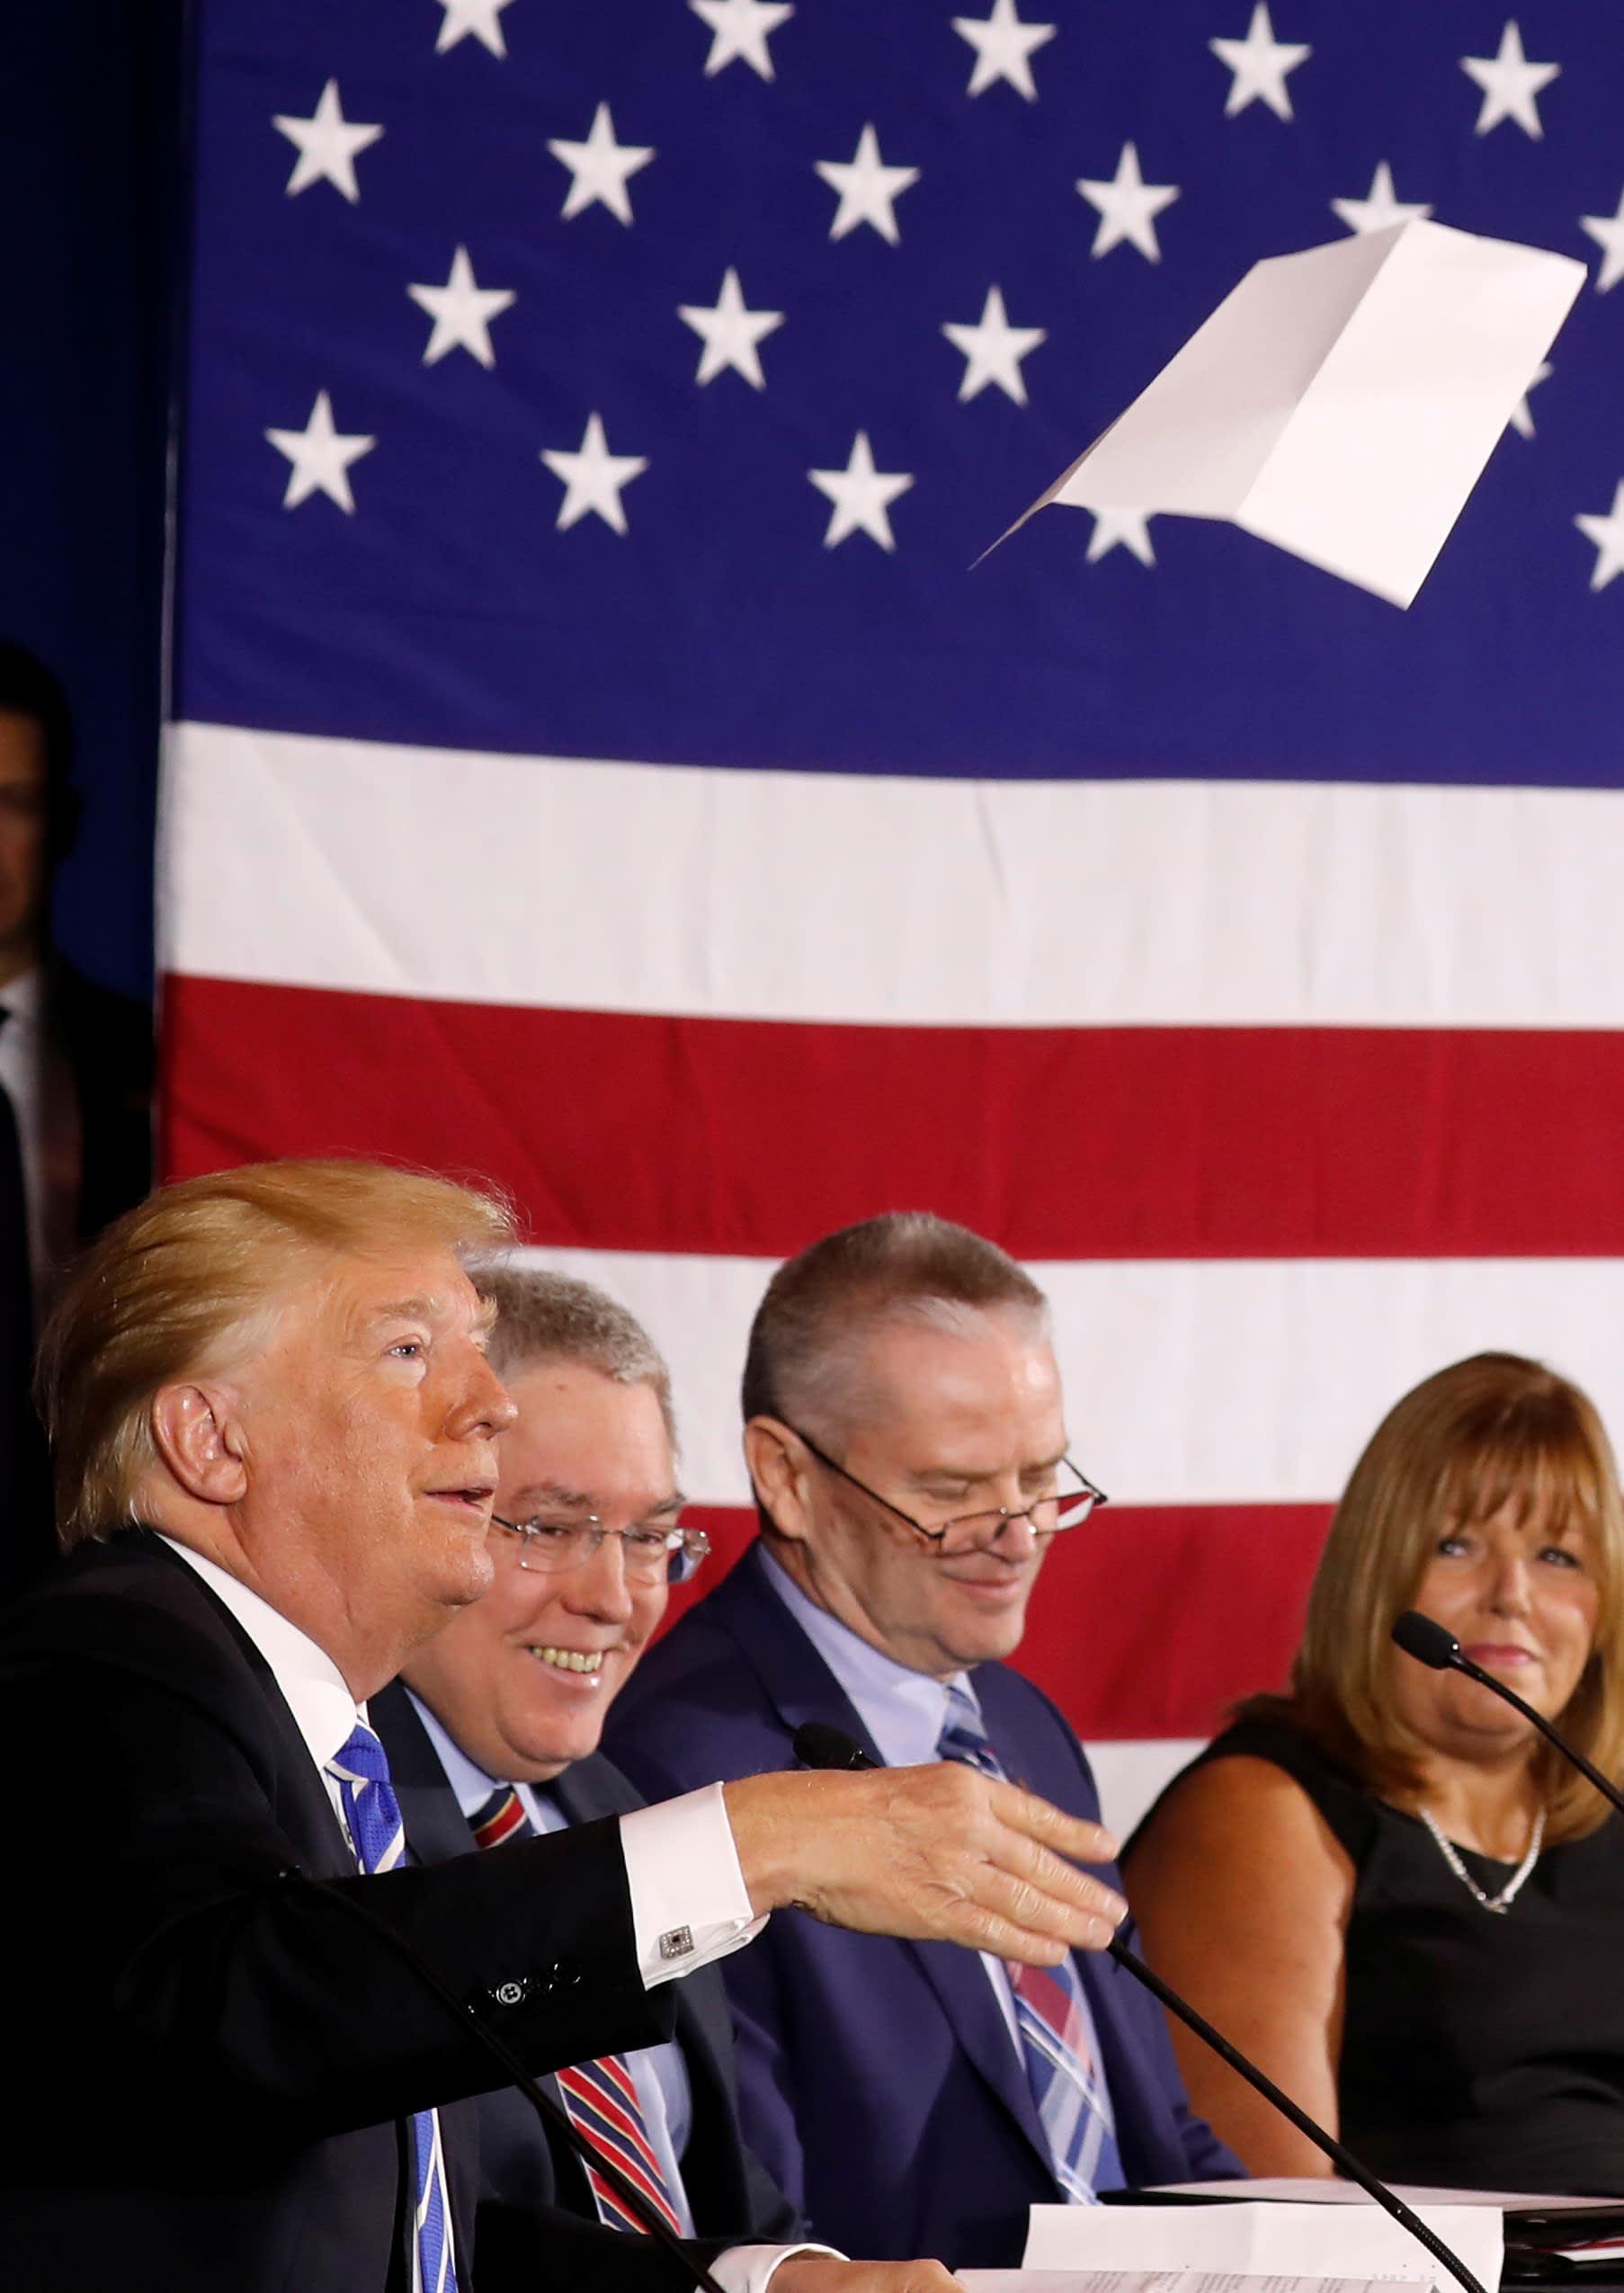 RT: Donald Trump throws paper 180405